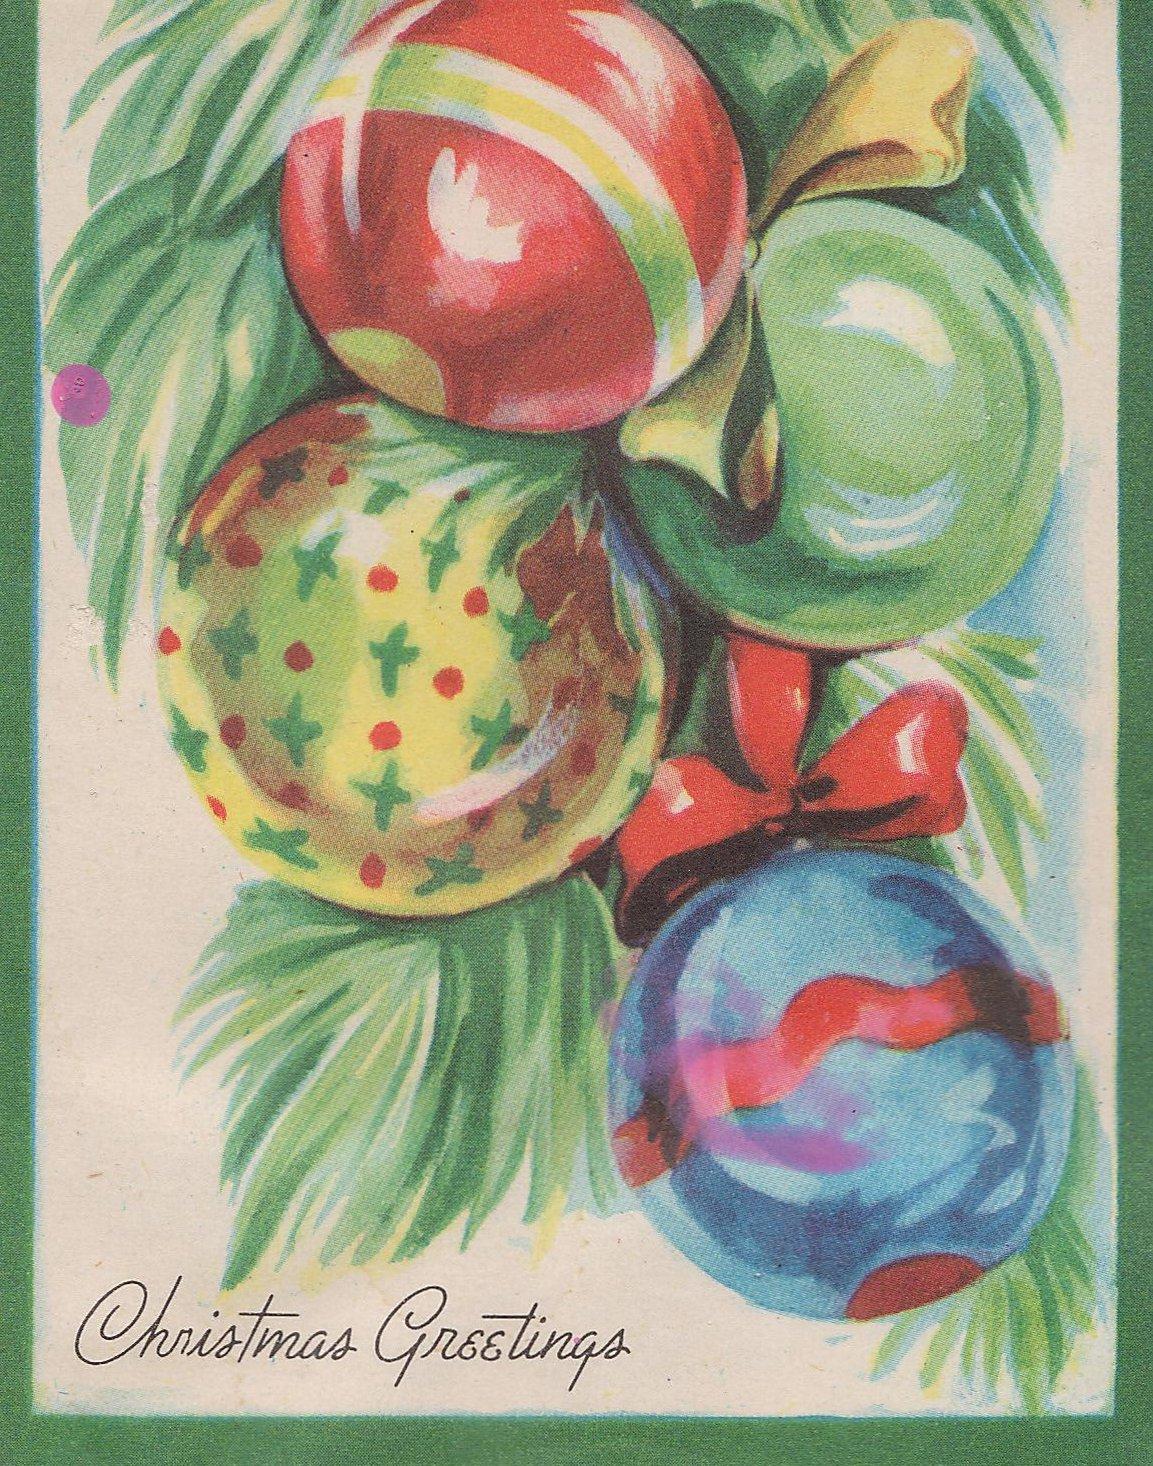 39 Happy Vintage Holidays Nostalgic Best Wishes 39 From